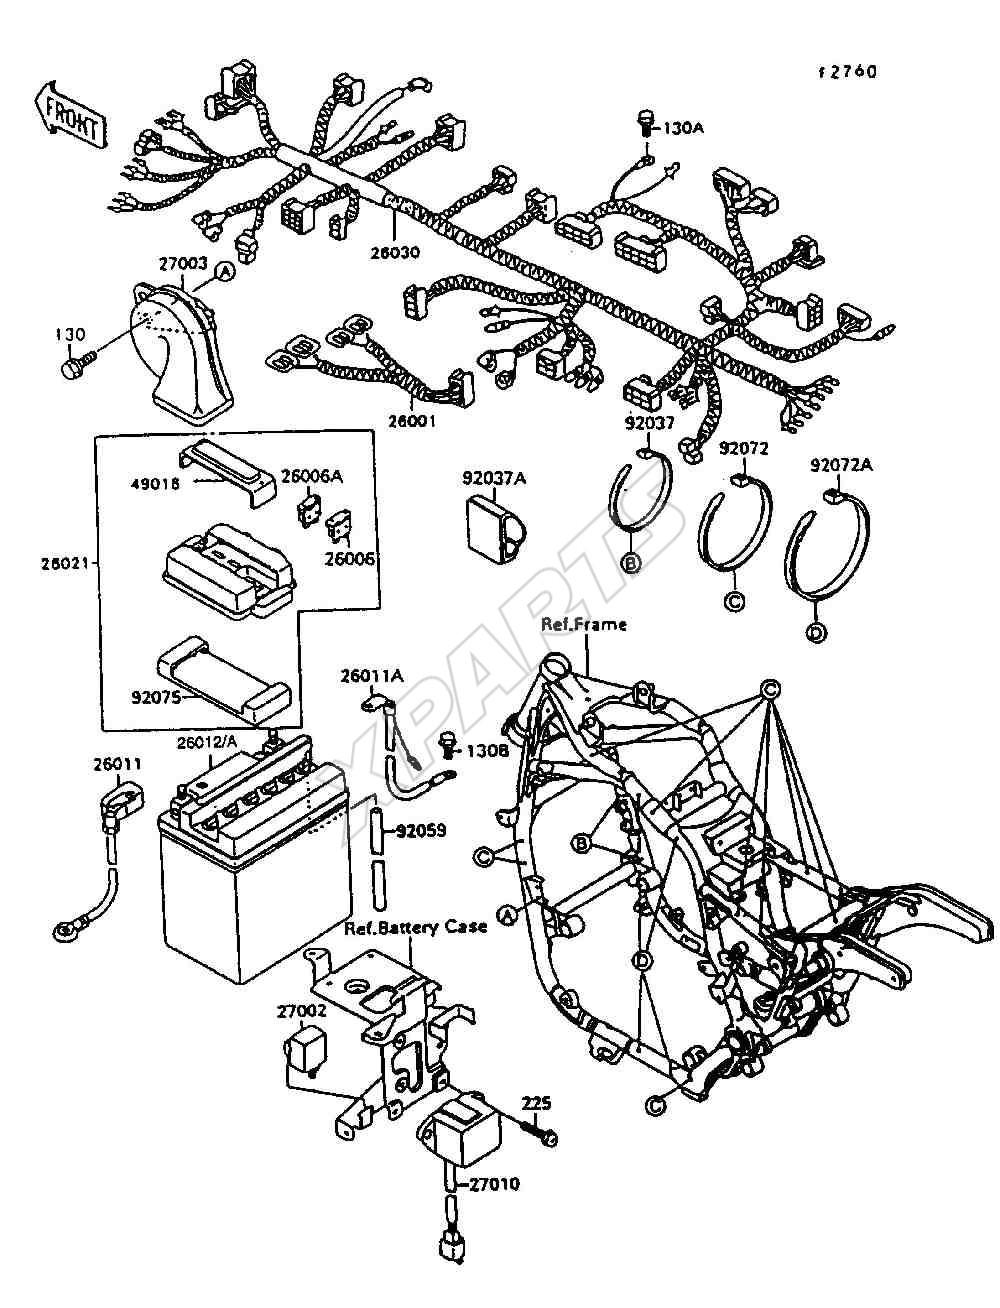 1998 kawasaki zx6r wiring diagram wiring diagram and schematics 49199395 1998 kawasaki zx6r wiring diagram